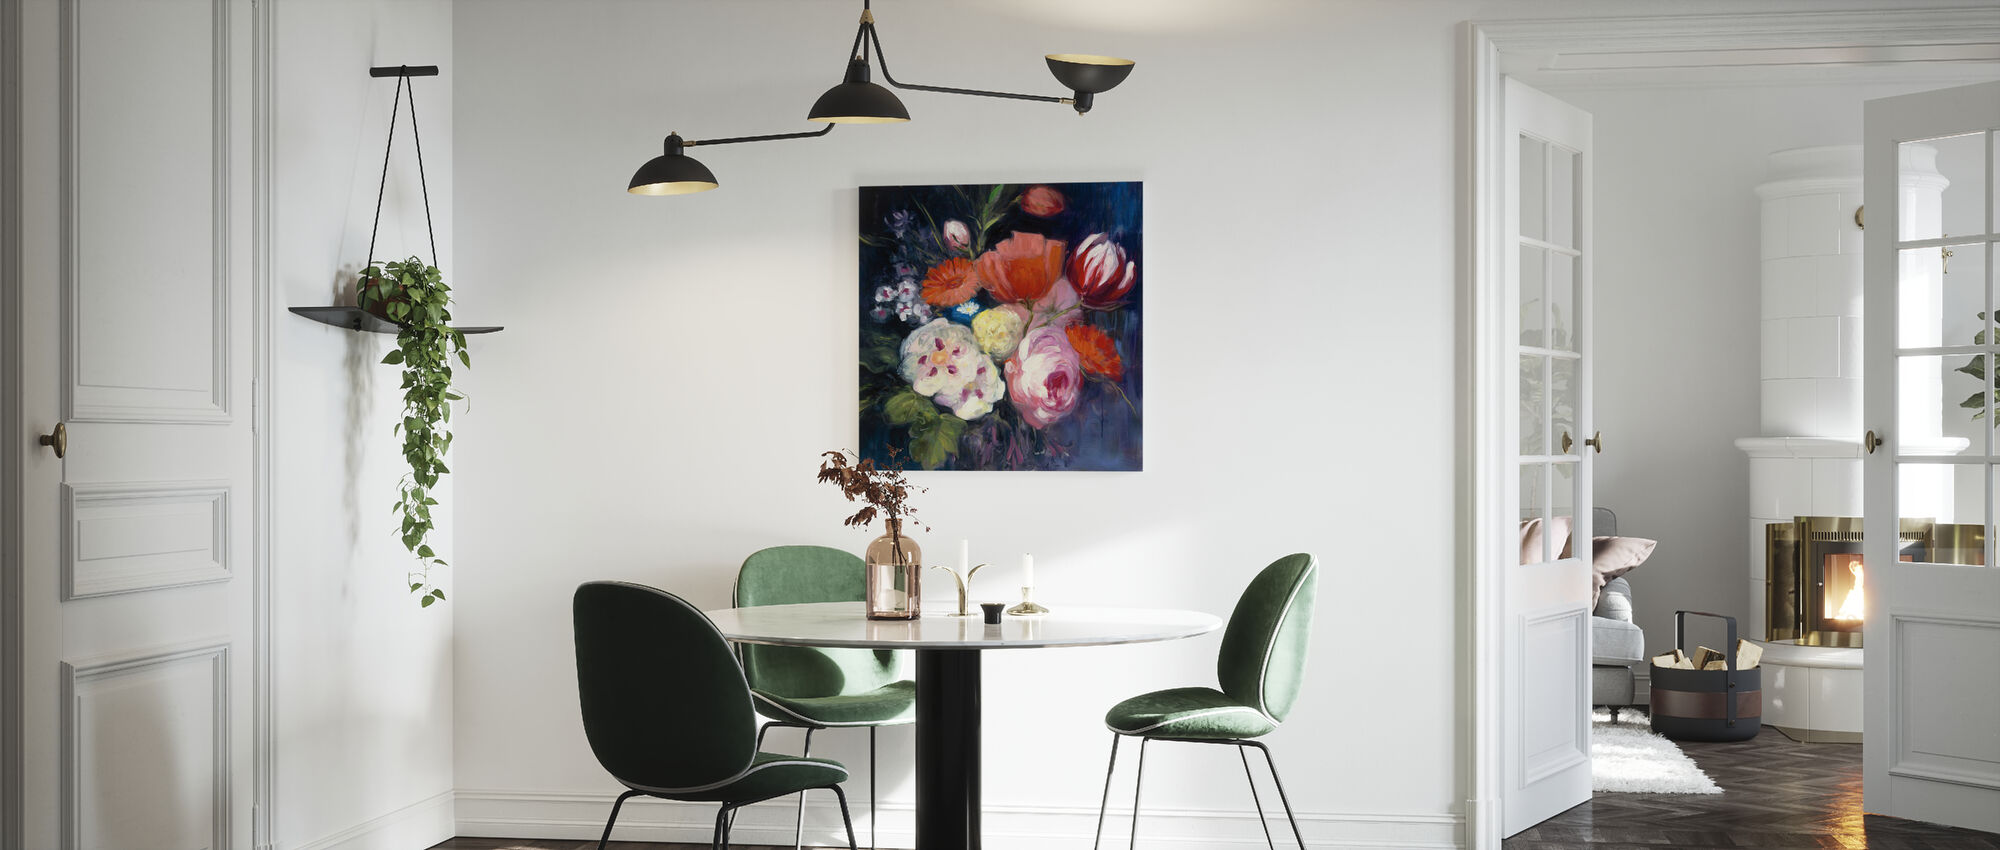 Verse gesneden - Canvas print - Keuken